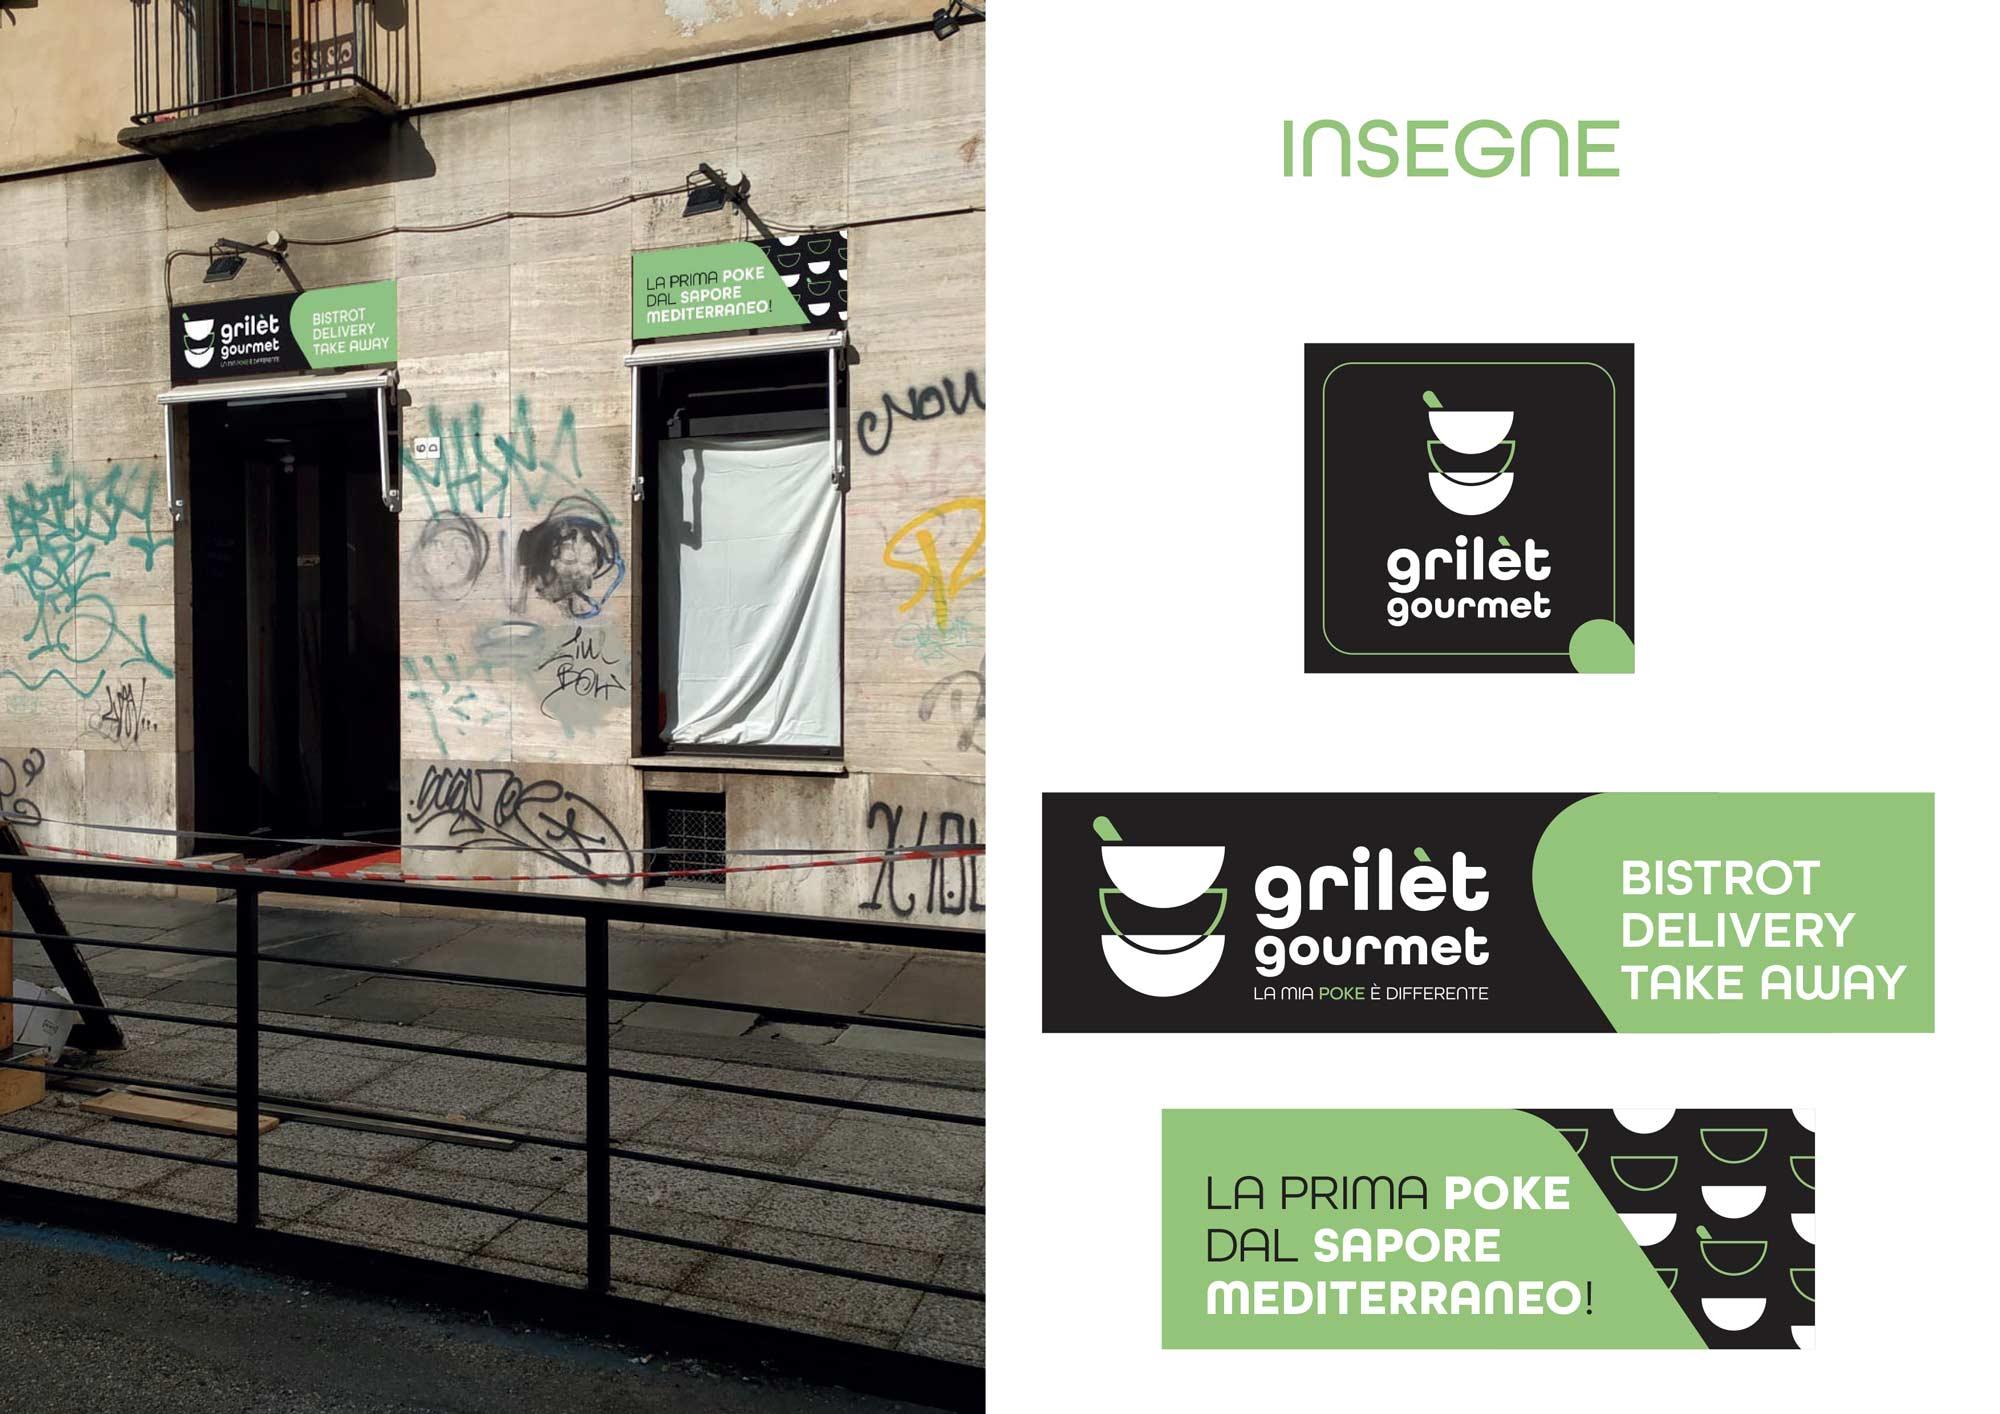 Caratteri_Agency-grilet-gourmet-brand-identity-6